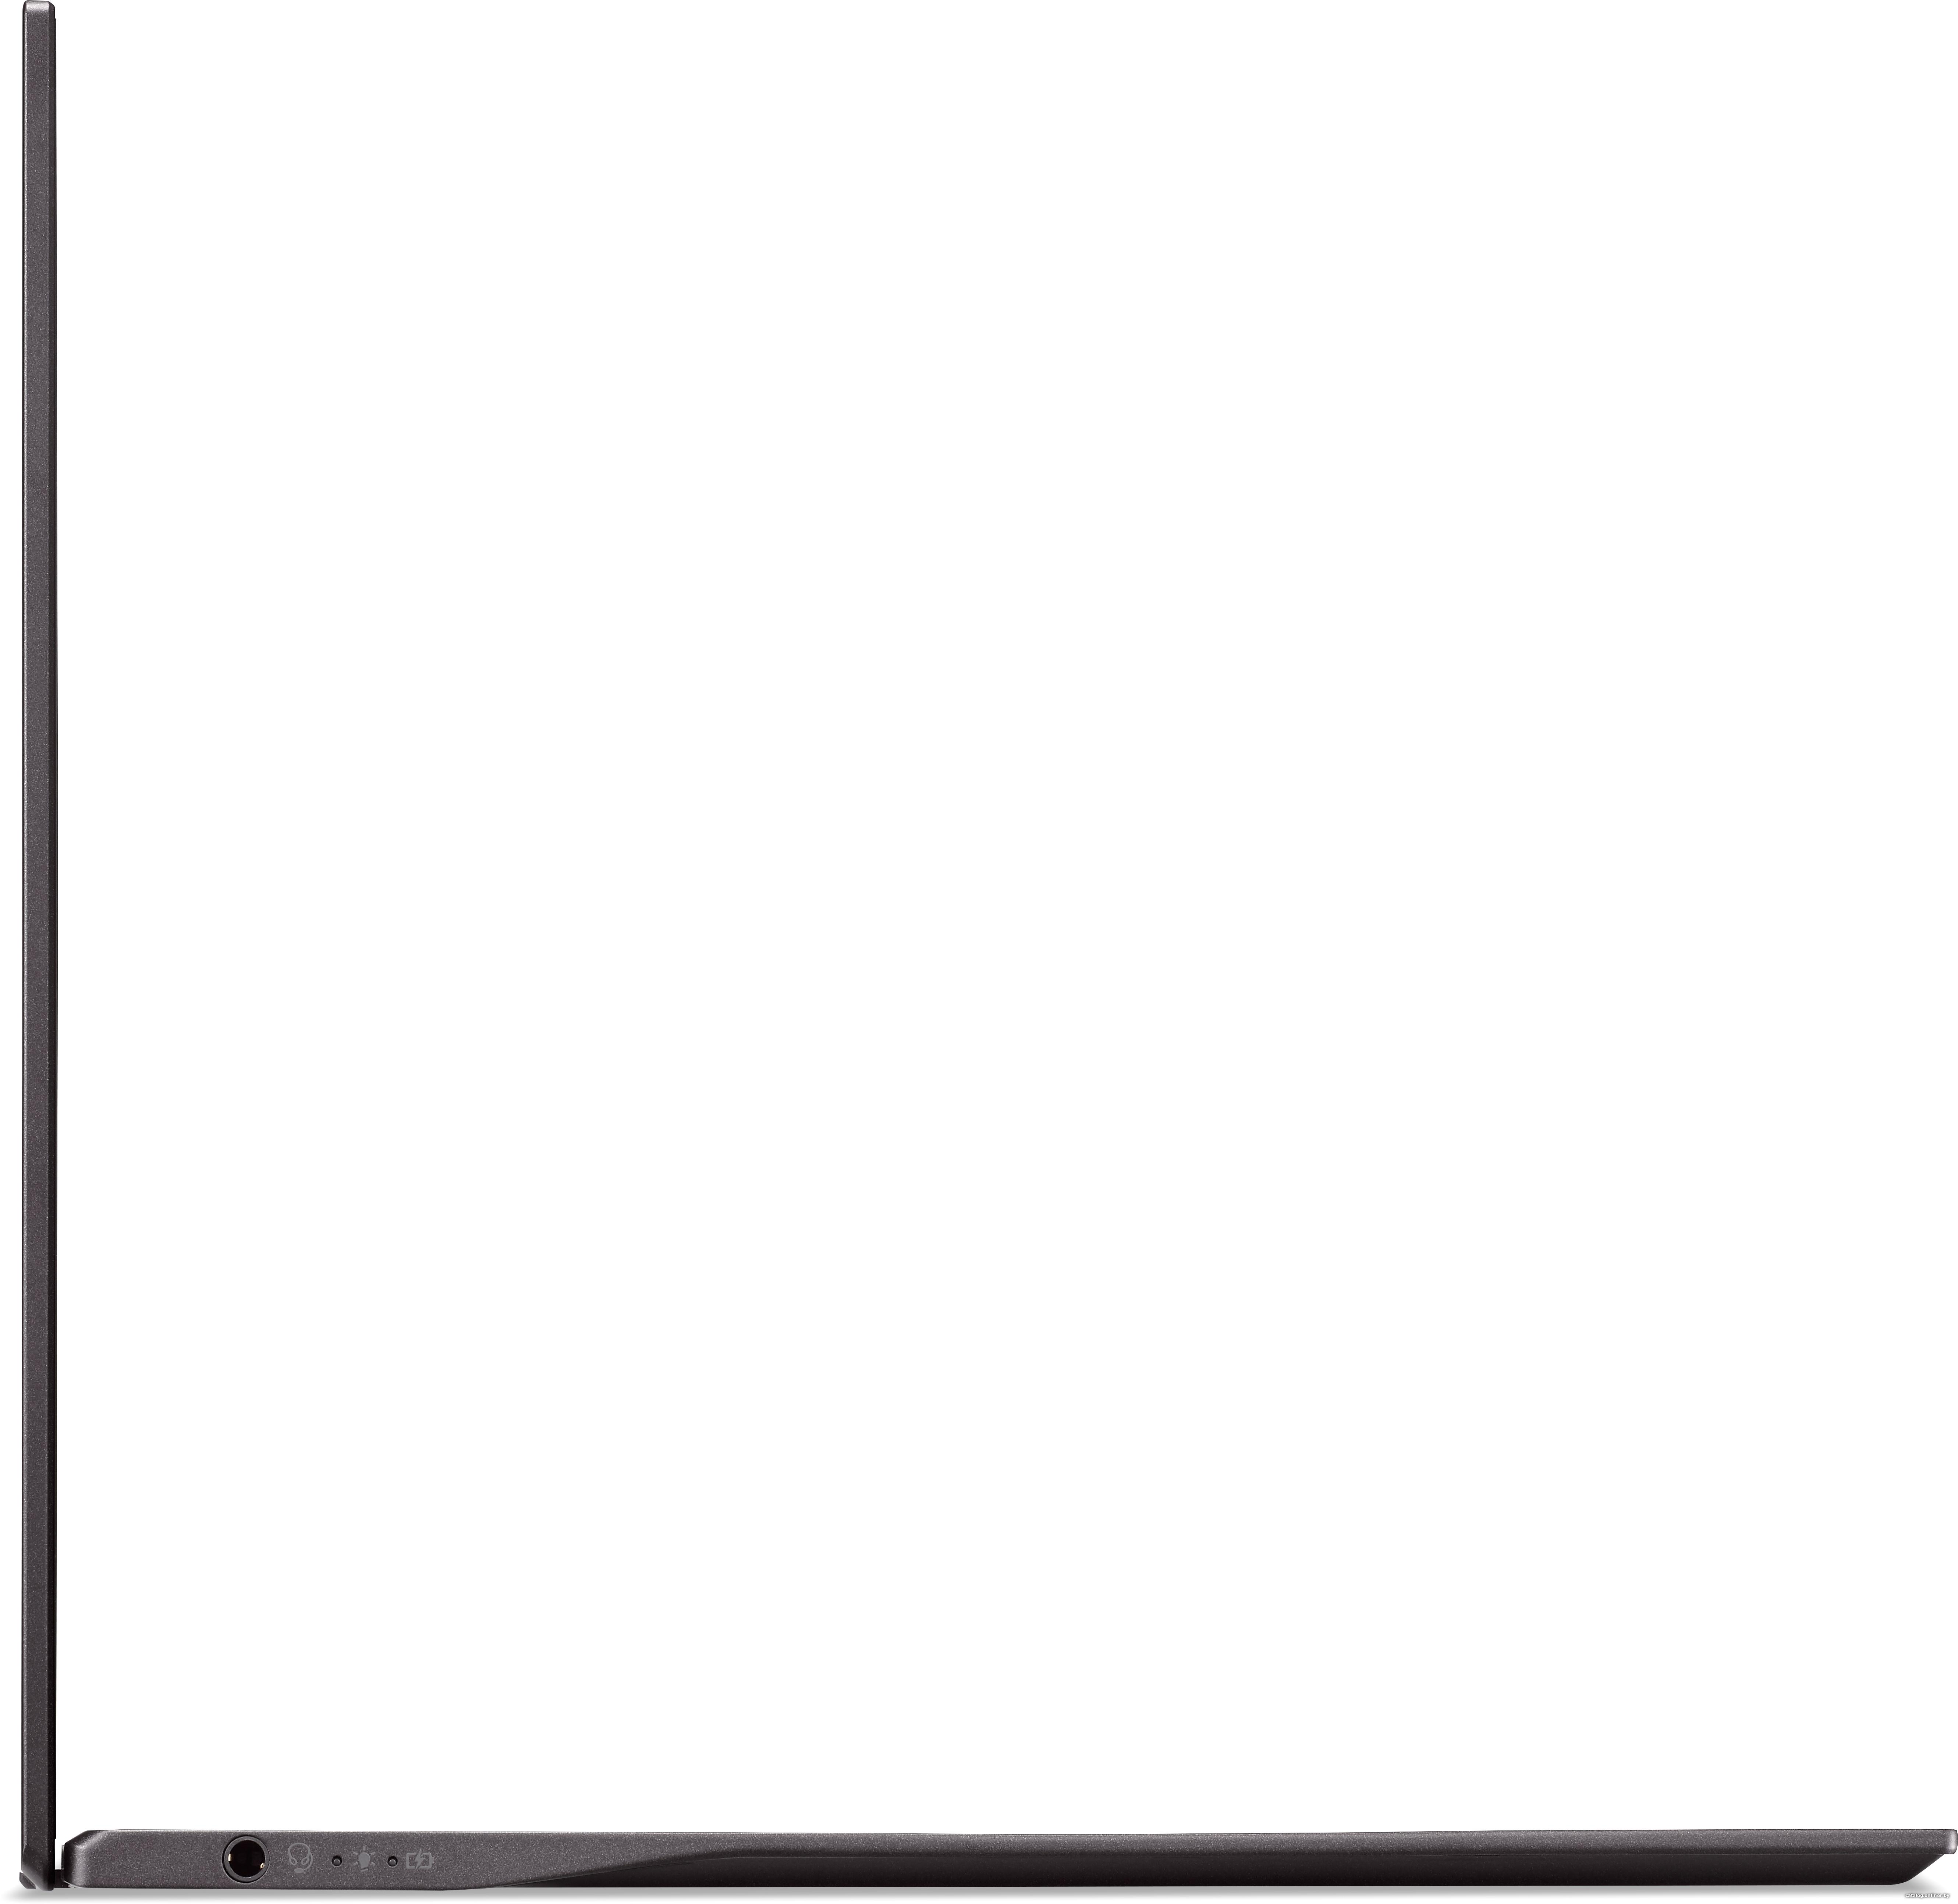 Acer Swift 7 SF714-52T-72EV NX.HB4EP.005 Image #2